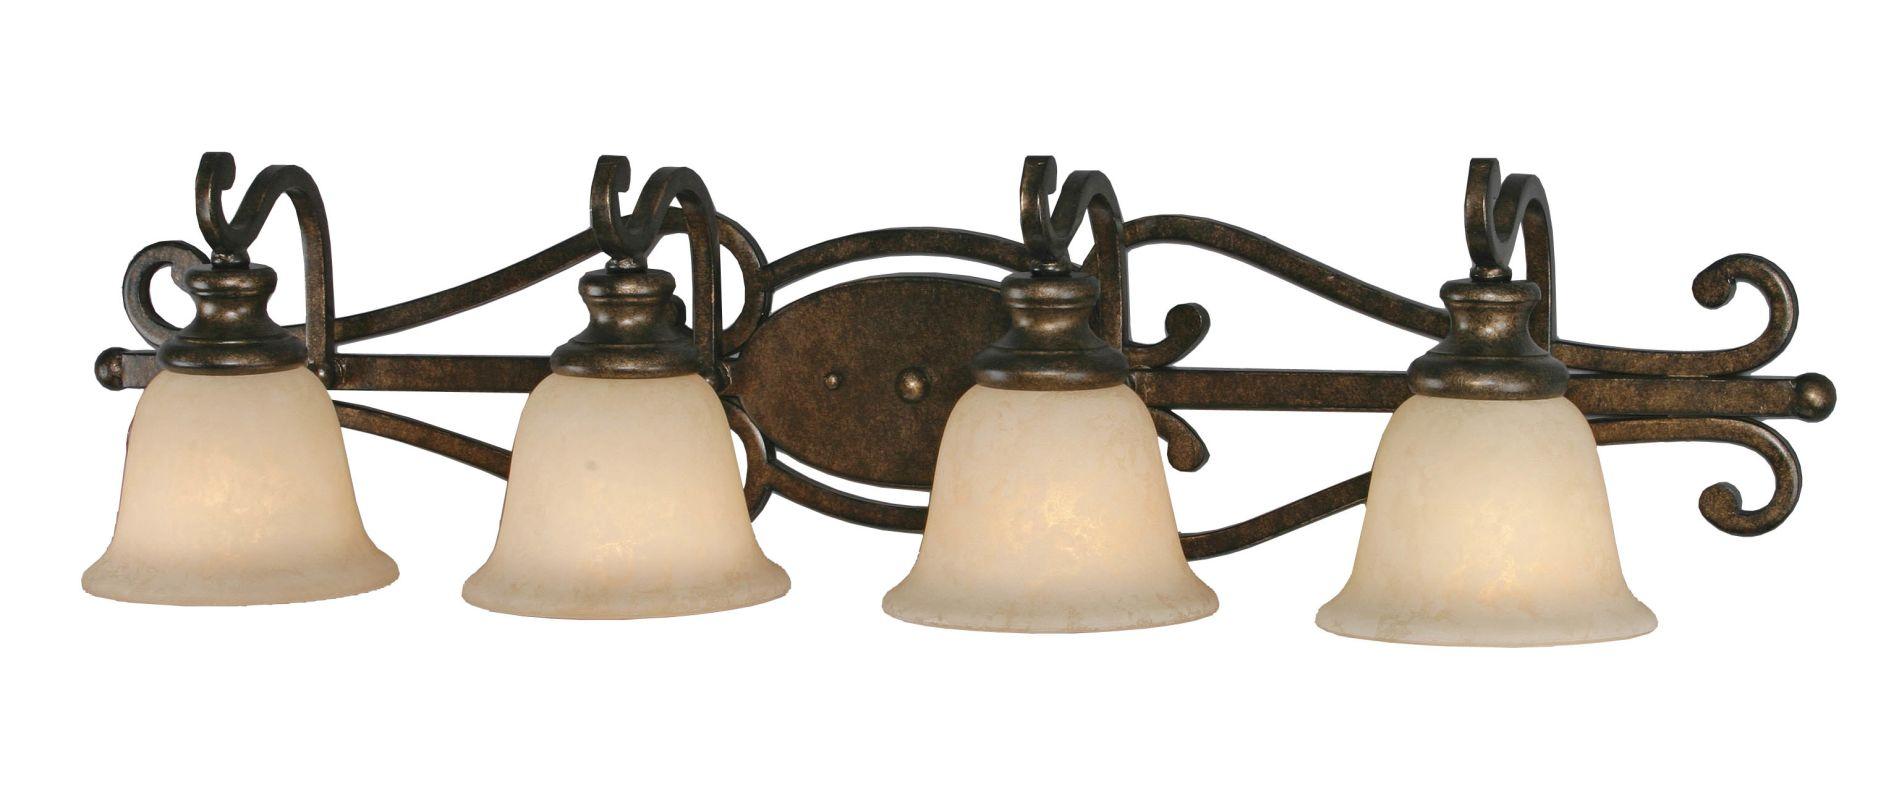 Golden Lighting 8063-BA4 Four Light Bathroom Fixture from the Sale $239.00 ITEM: bci640701 ID#:8063-BA4 BUS :